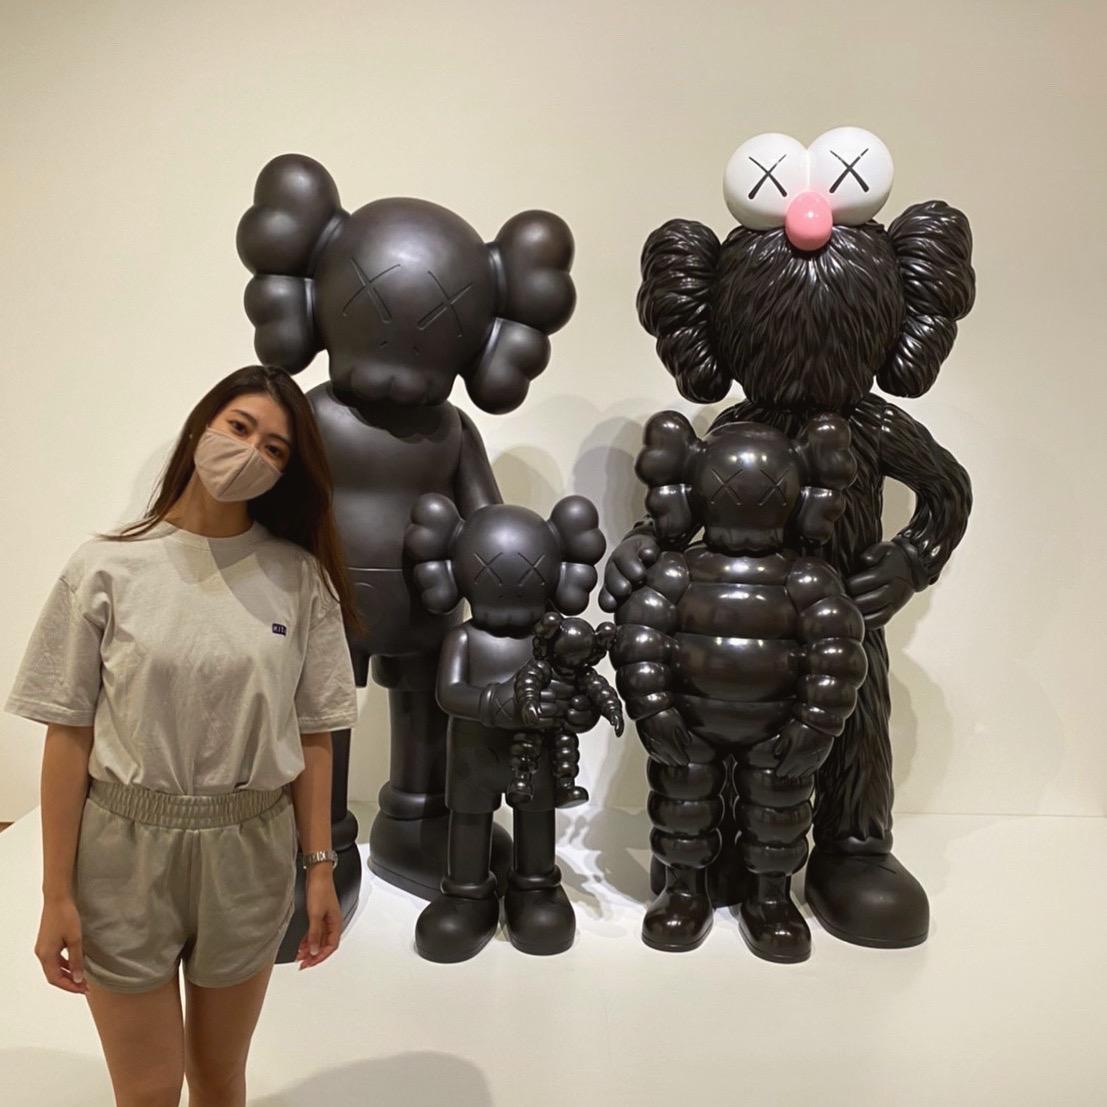 【KAWS TOKYO FIRST】カウズの大展覧会に行ってきました。_1